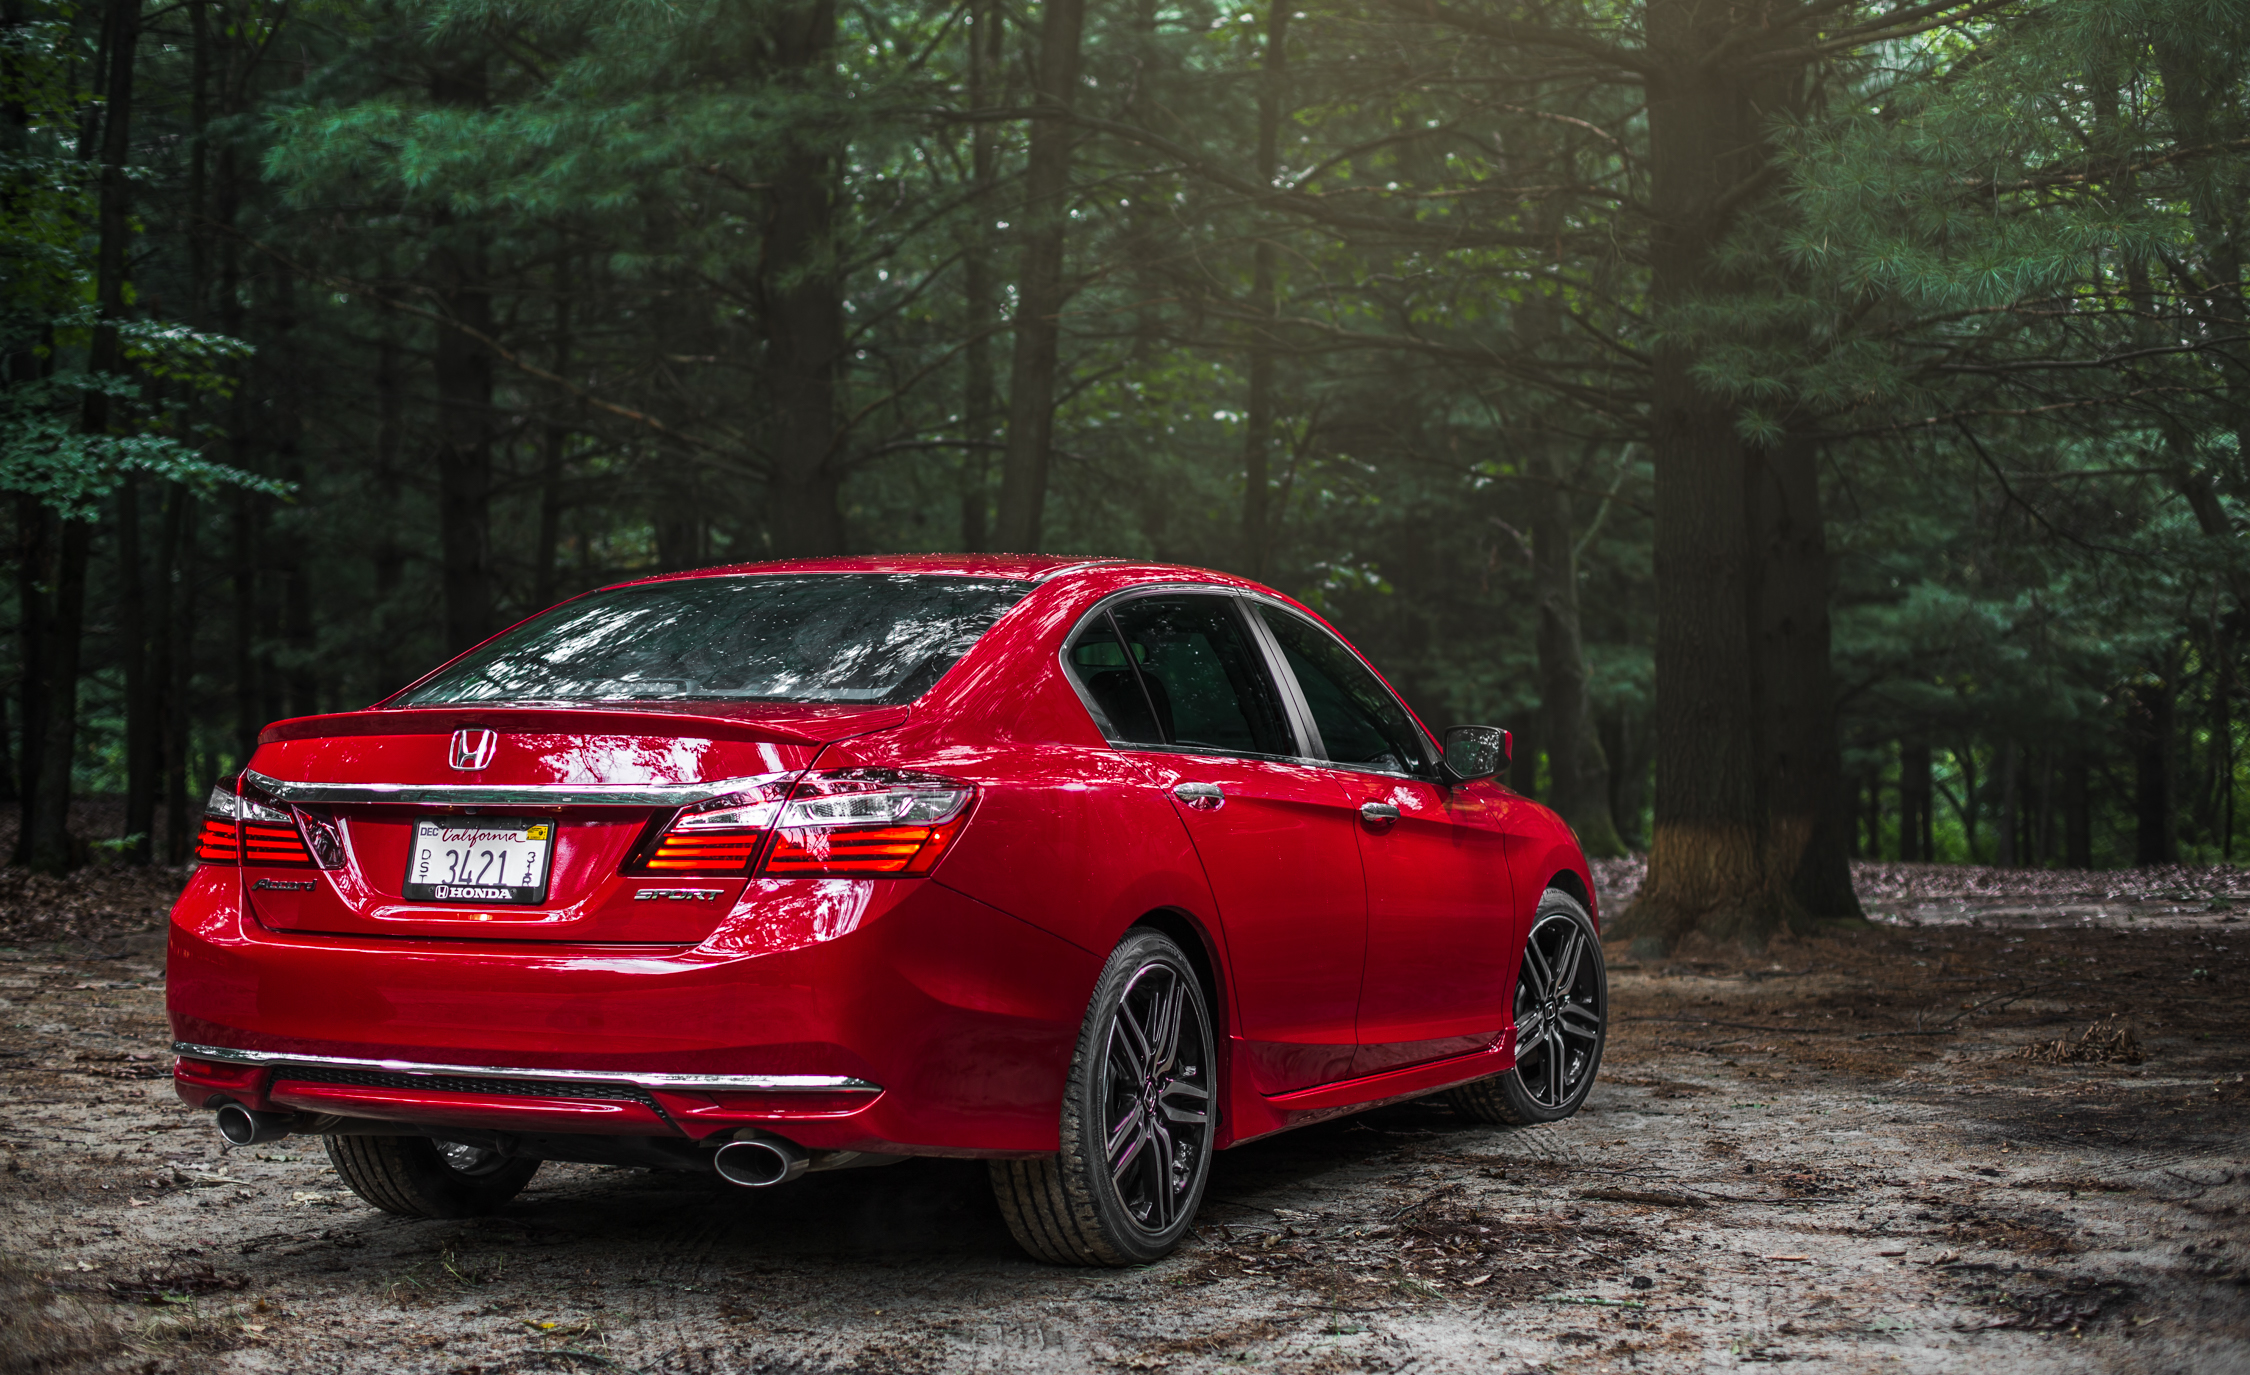 2016 Honda Accord Sport Exterior Full Rear and Side